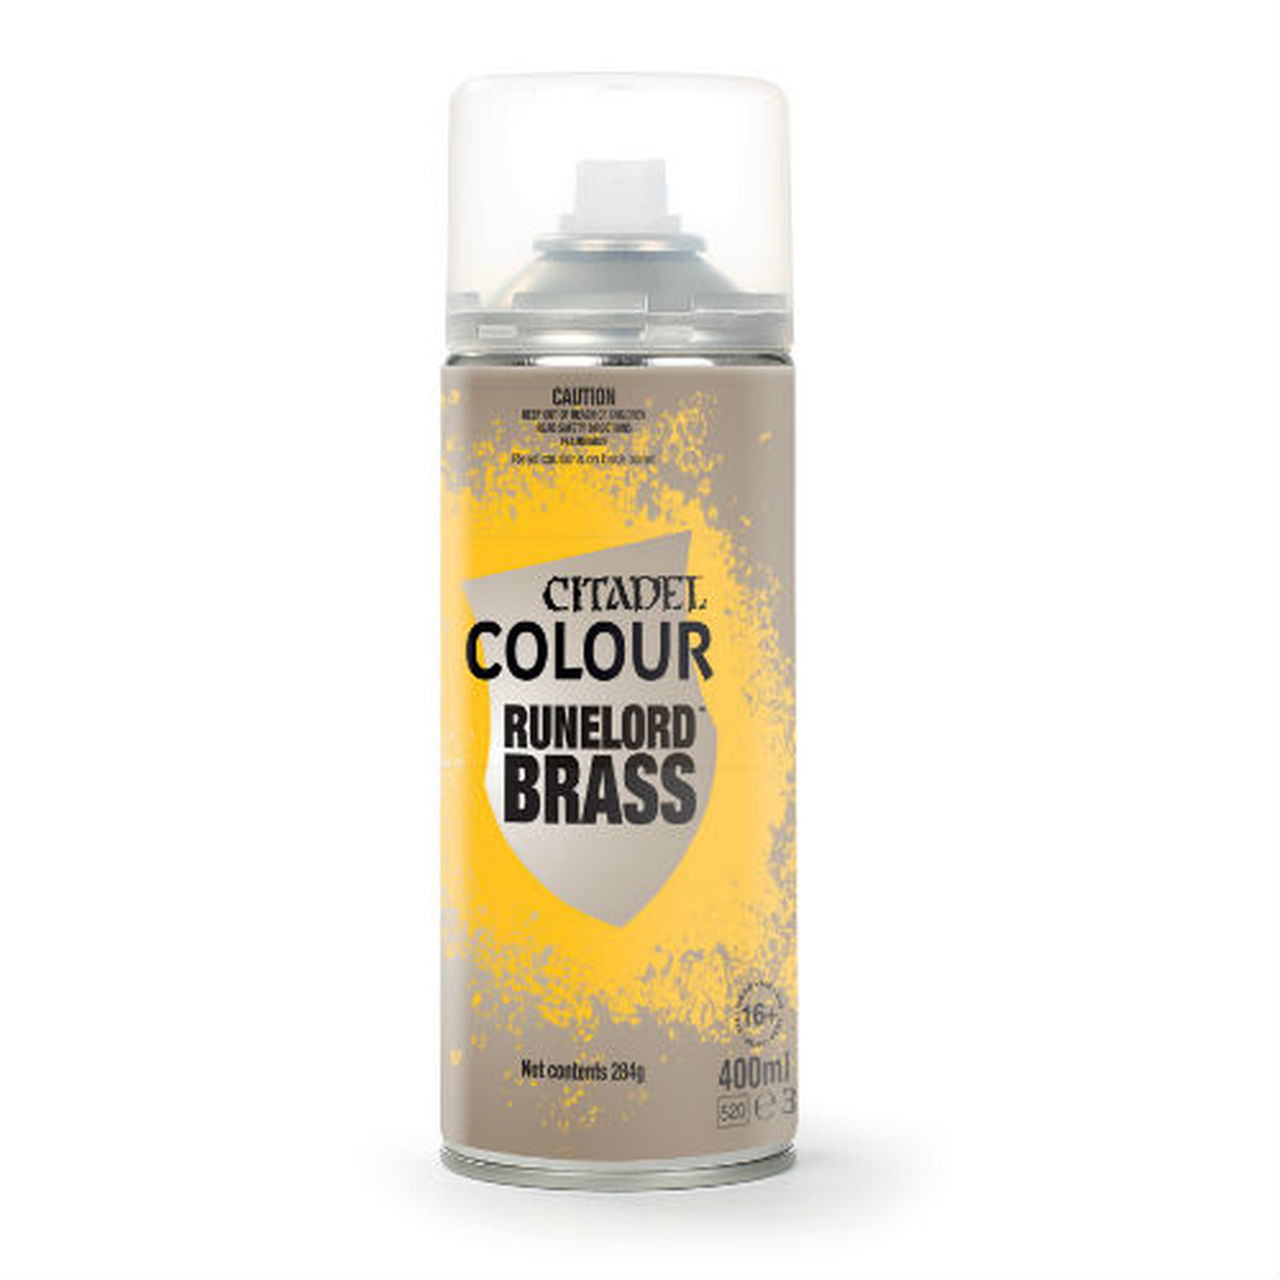 Citadel Colour Spray Runelord Brass 62-35